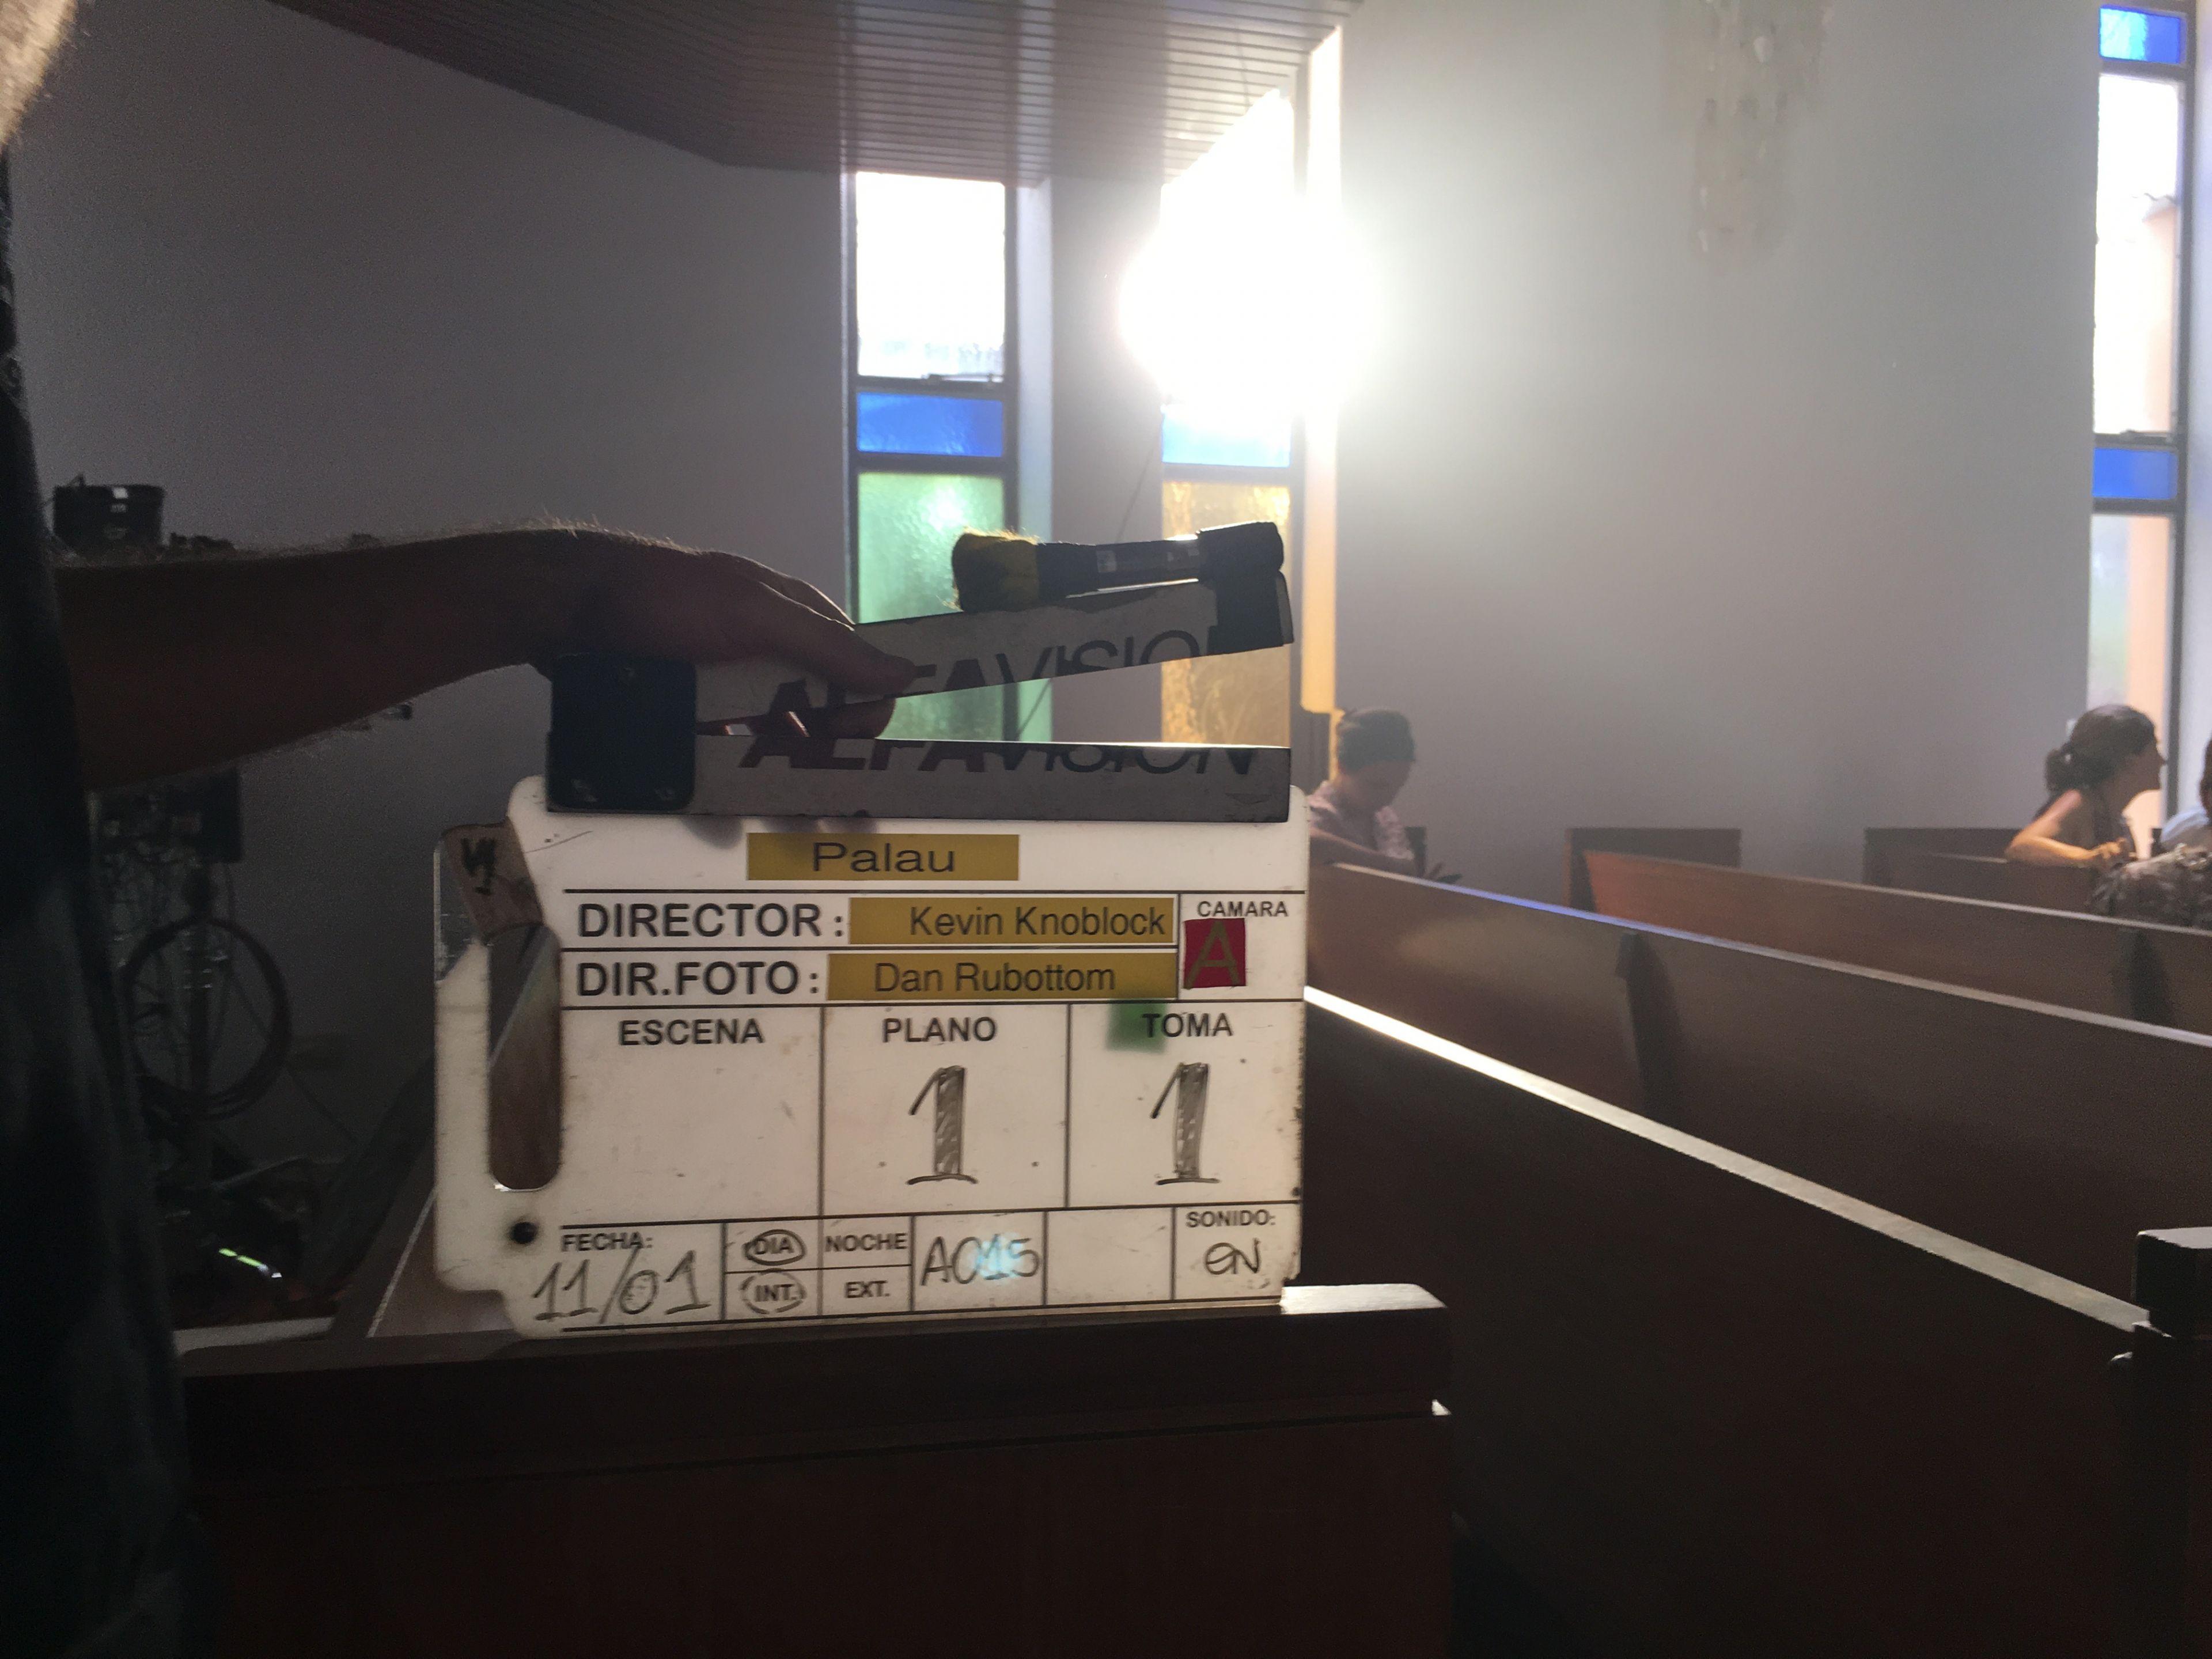 Filmmaker Friday featuring filmmaker Dan Rubottom 5